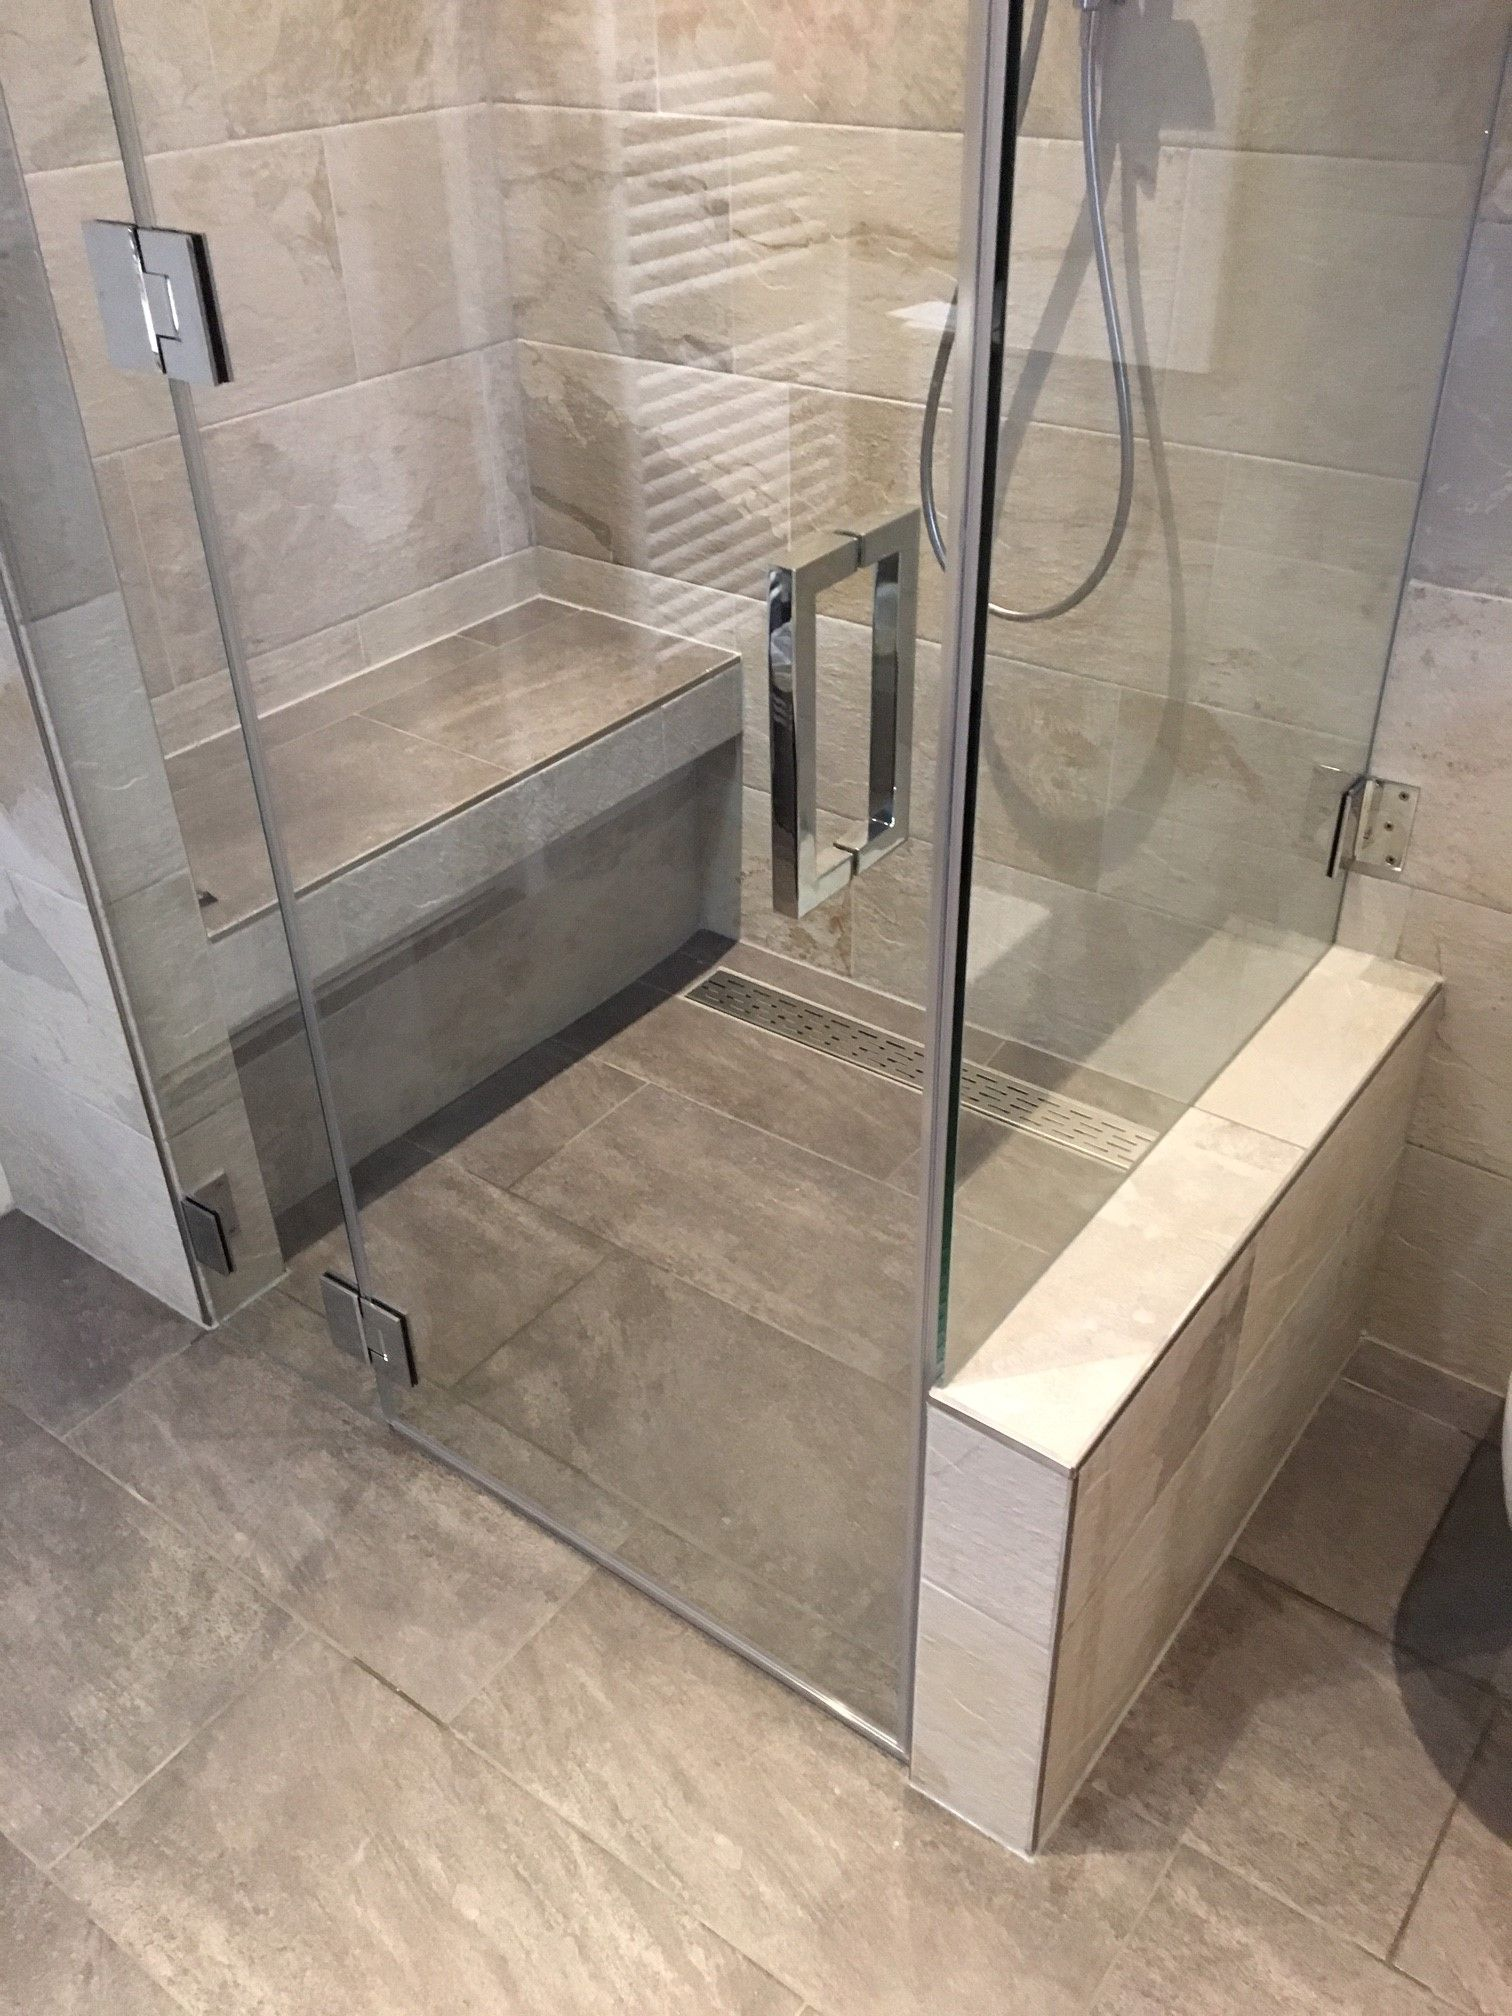 maatwerk glazen douchewand gebruikt als stoomkabine c l e a r